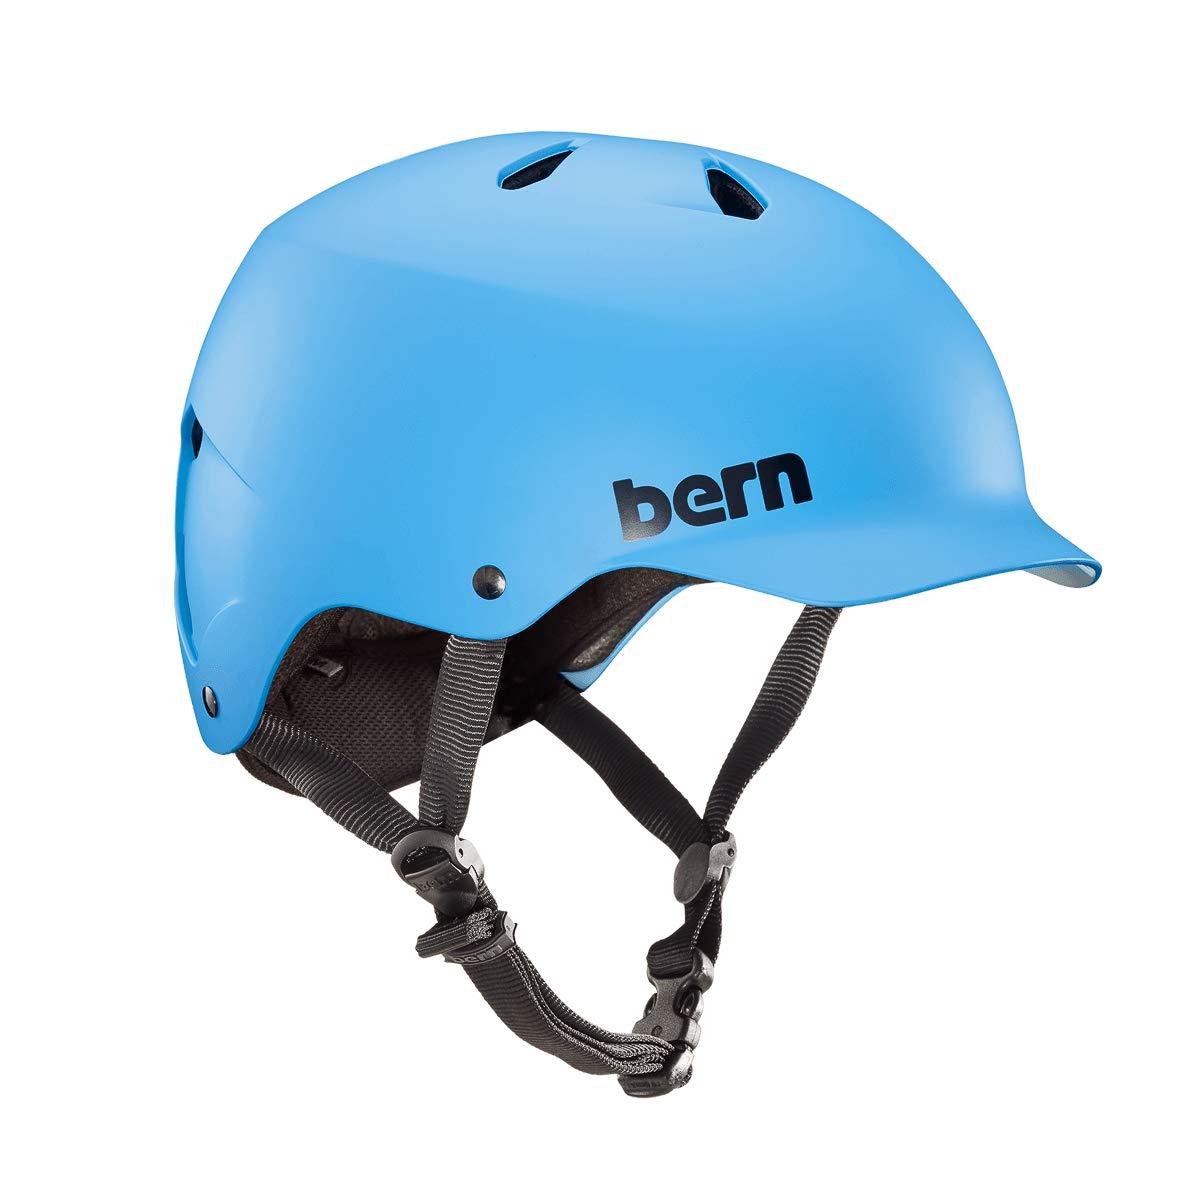 Bern Watts Helmet - Matte Cyan Blue Small